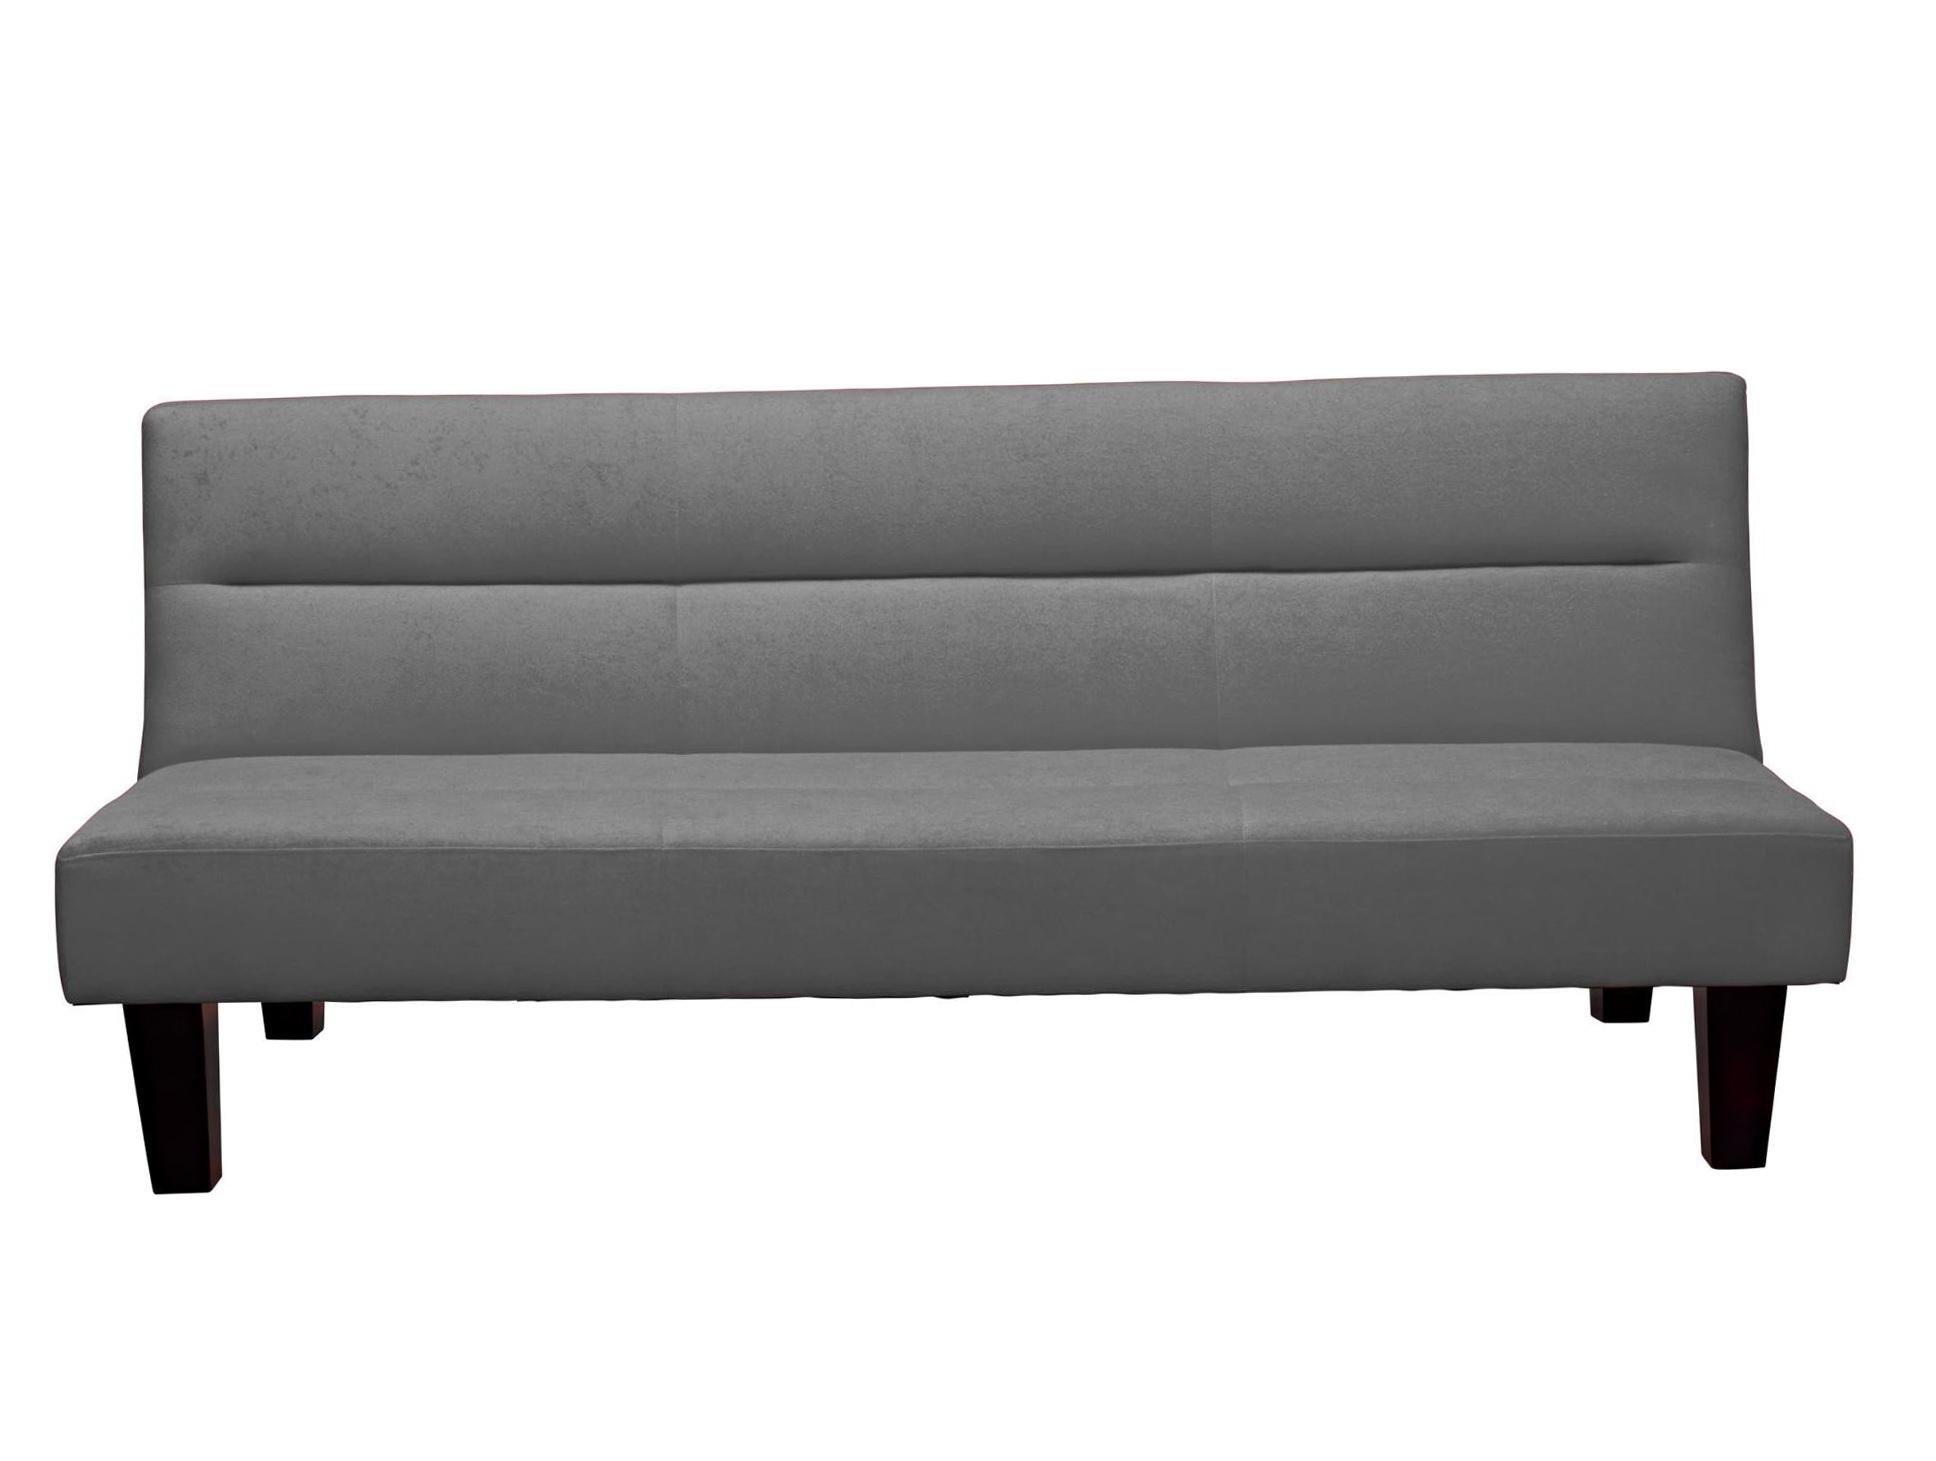 Kebo Futon Sofa Bed Cover